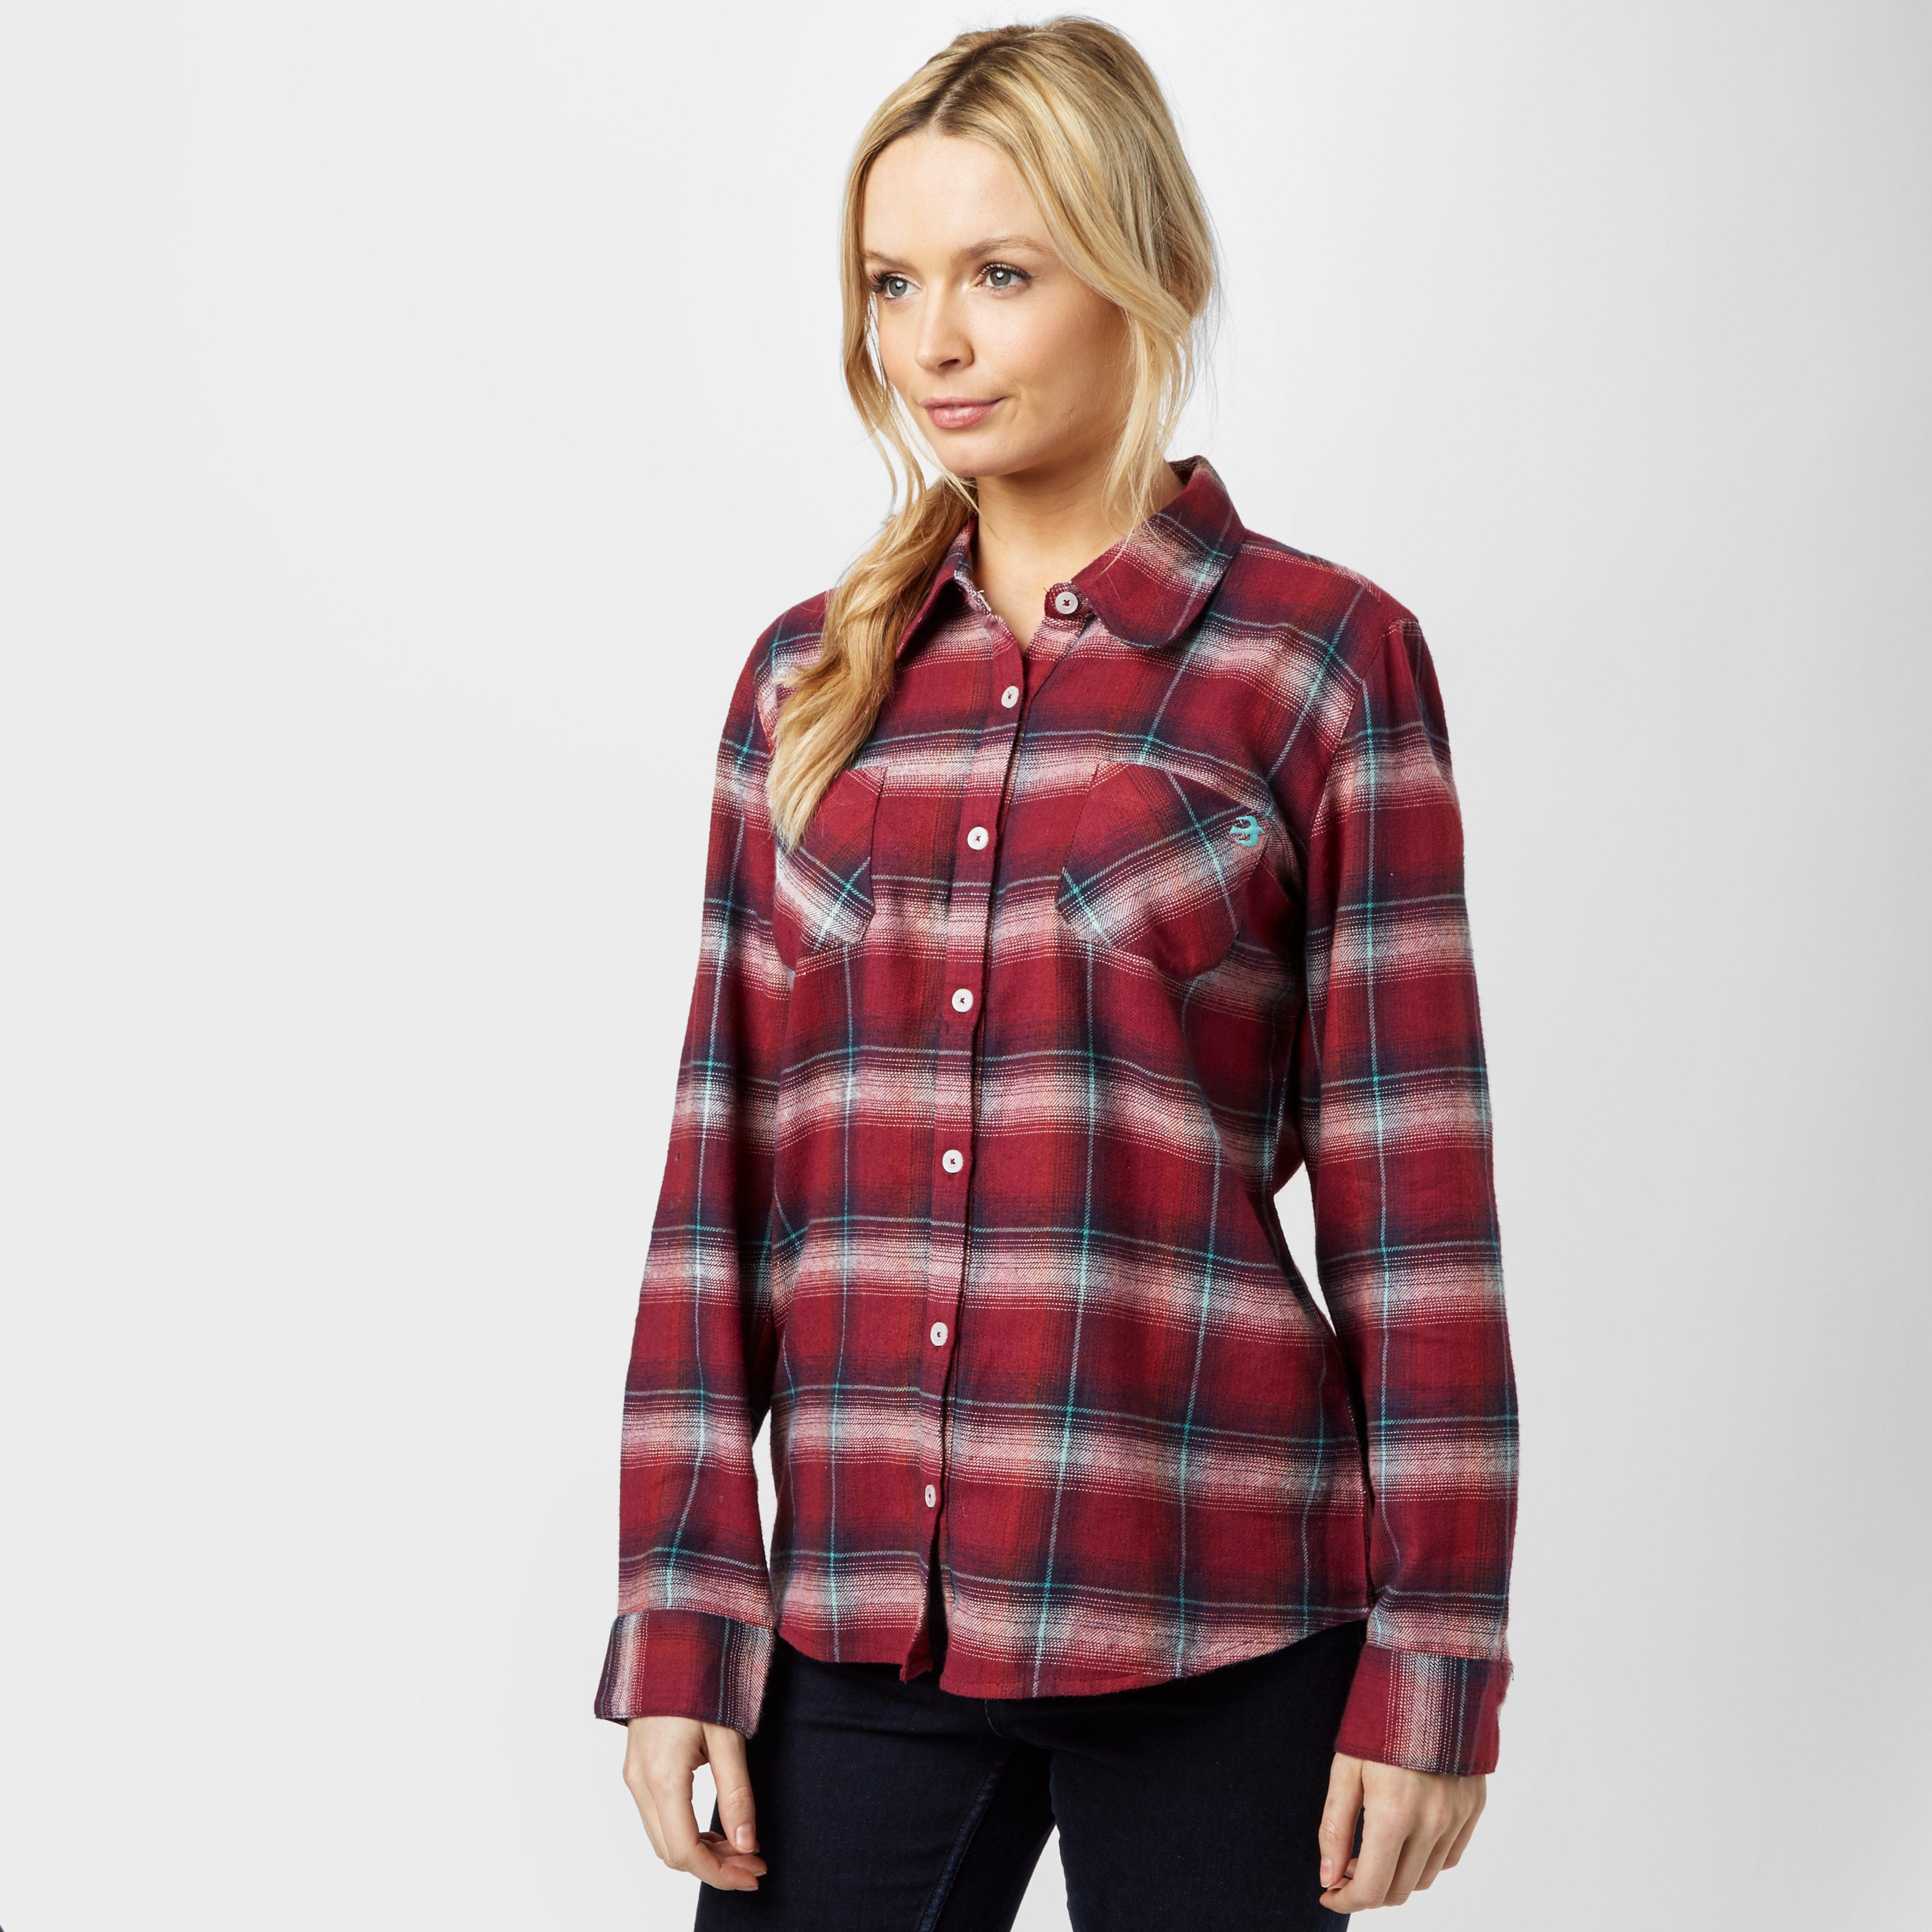 Brakeburn Brakeburn Womens Check Flannel Shirt - Red, Red